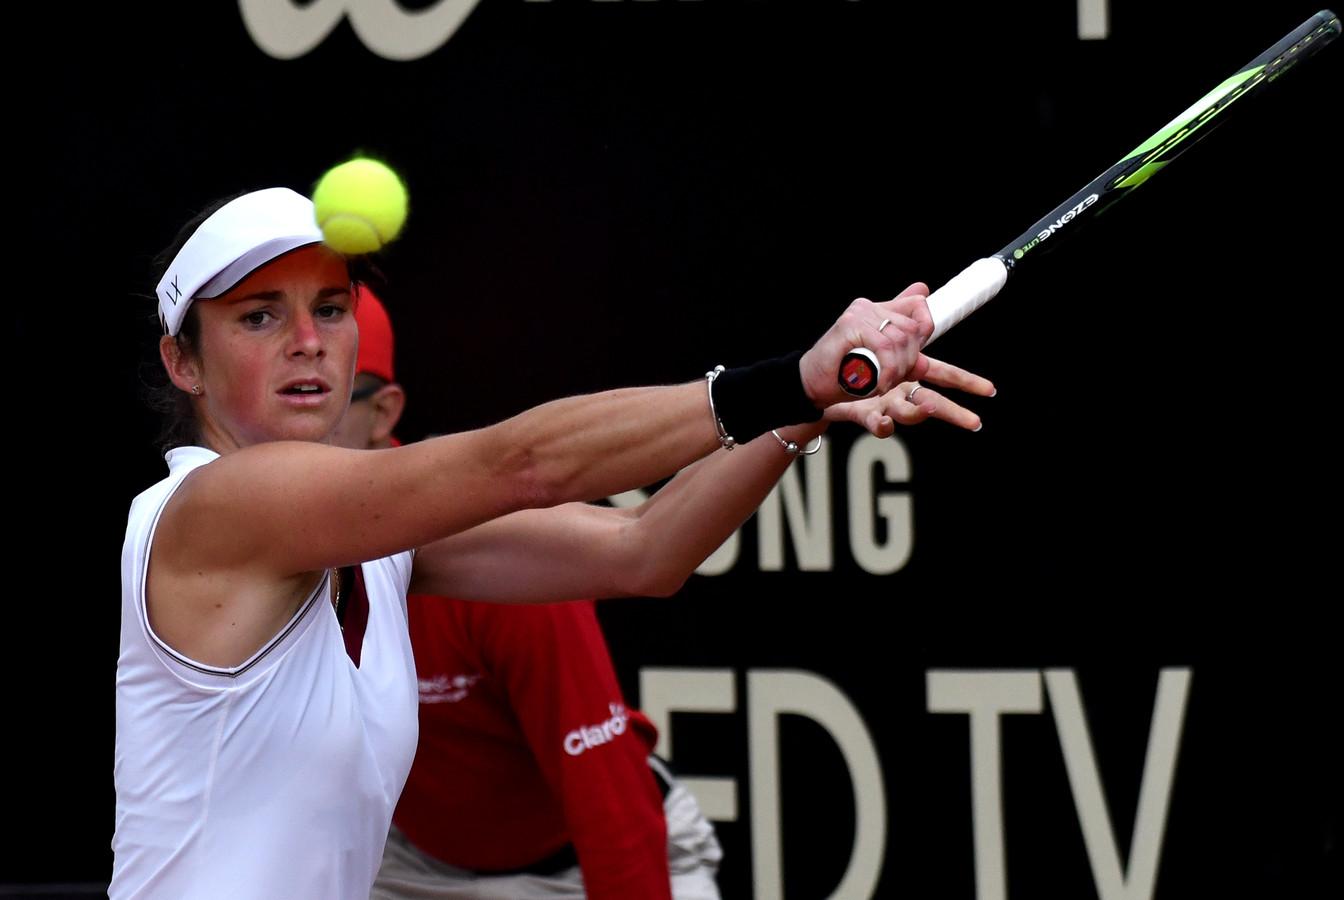 Bibiane Schoofs speelt op het NK. Ze pakte in 2016 de nationale titel.